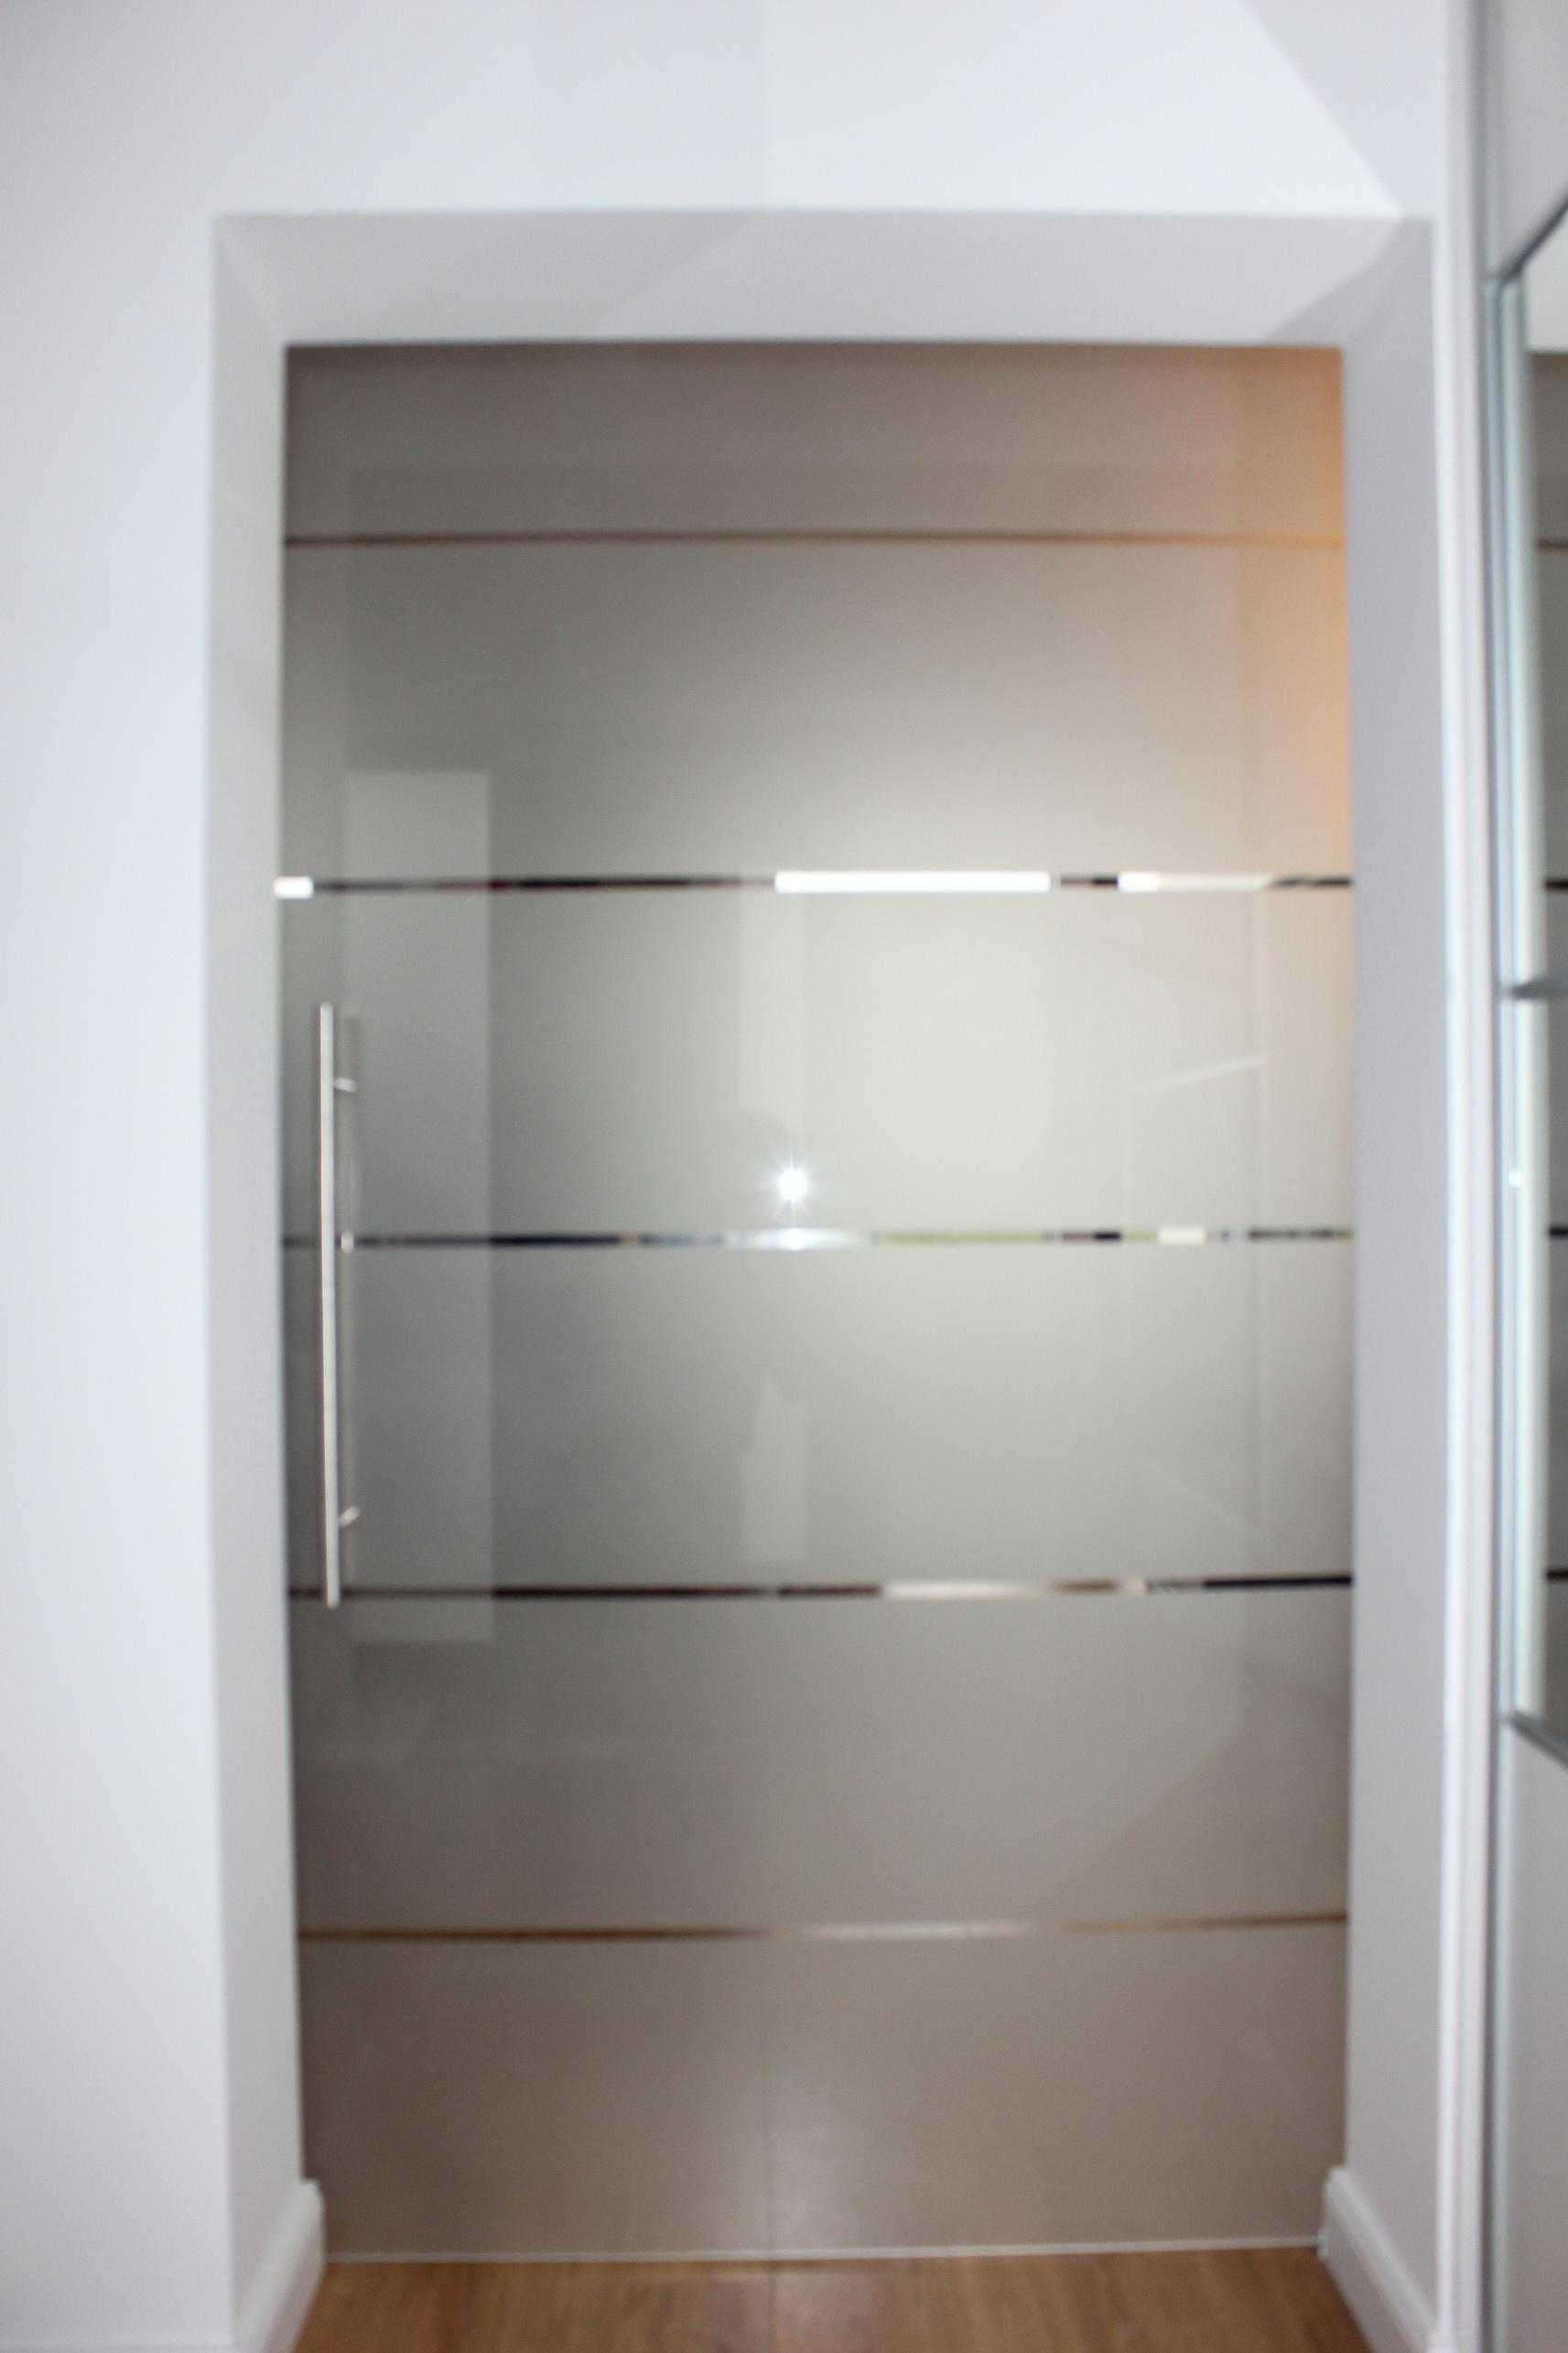 sklenené dvere GG-22.4